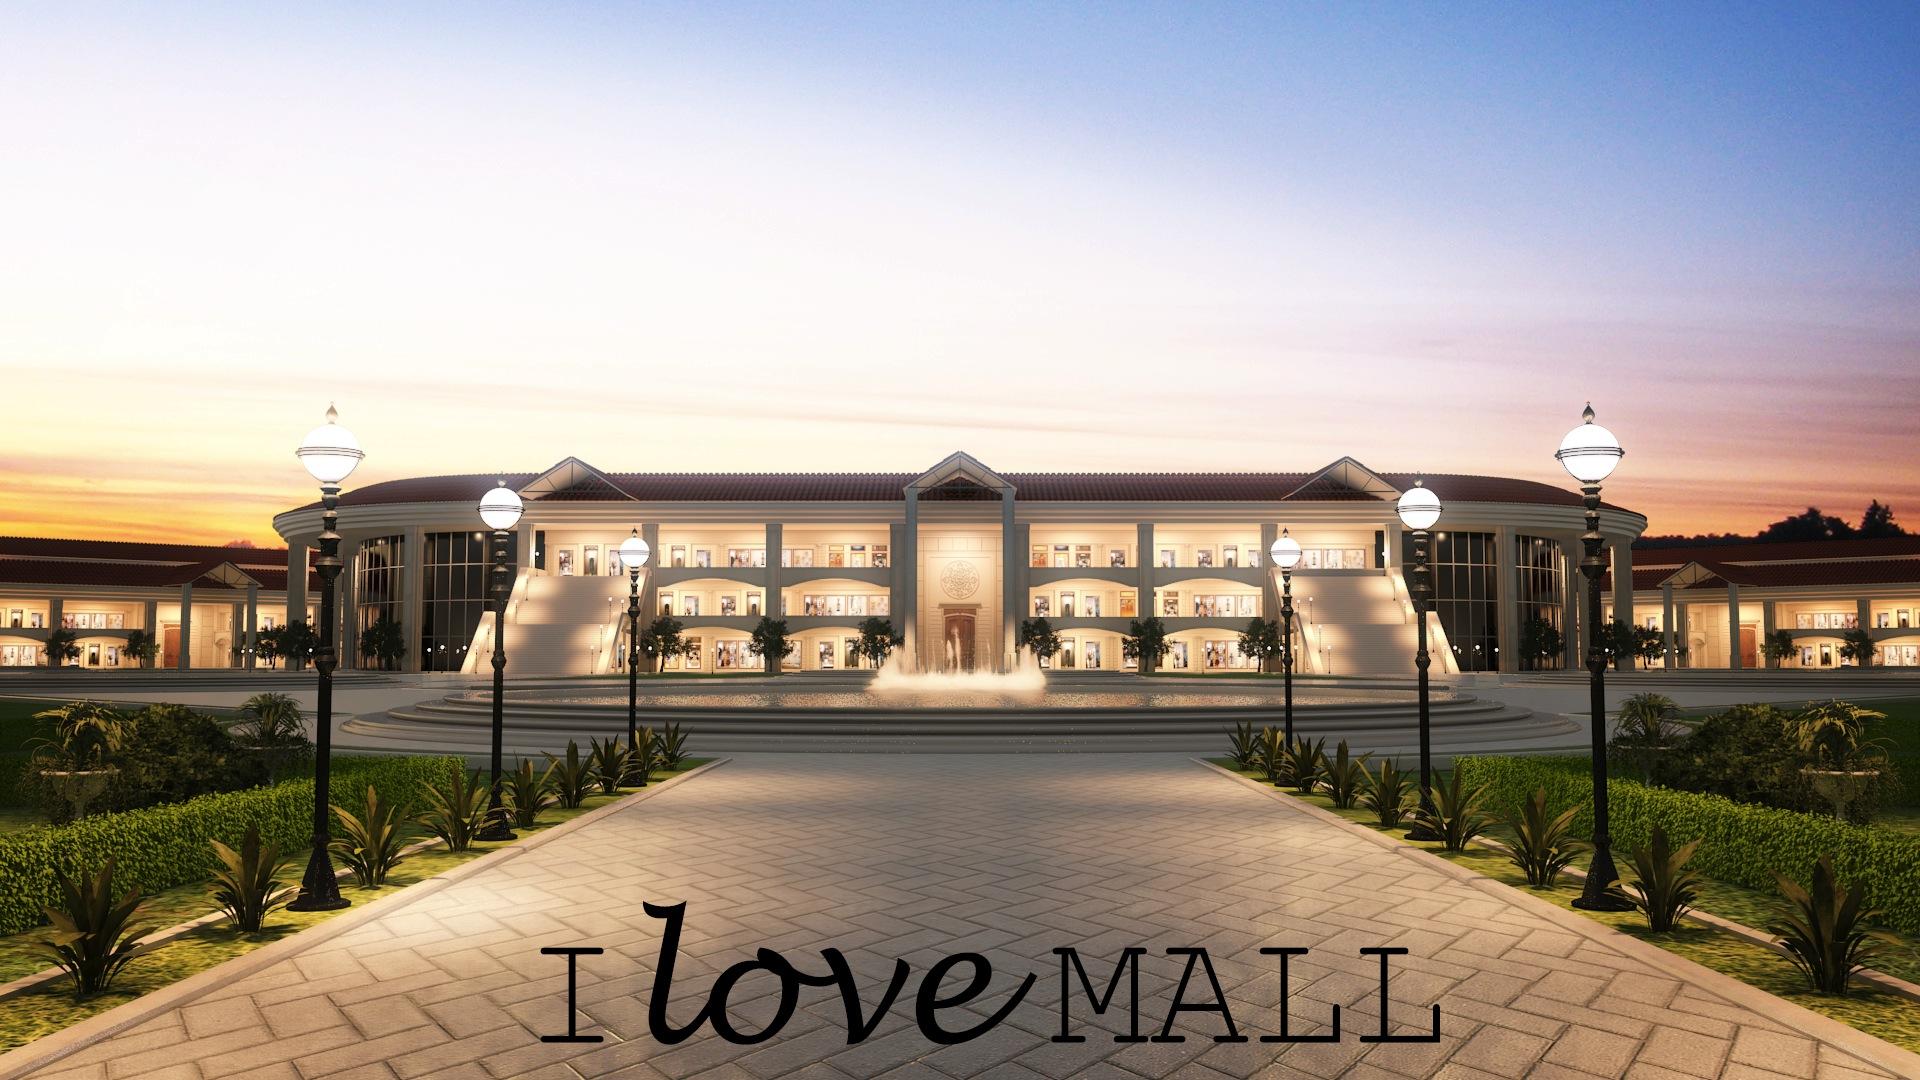 i love mall 1